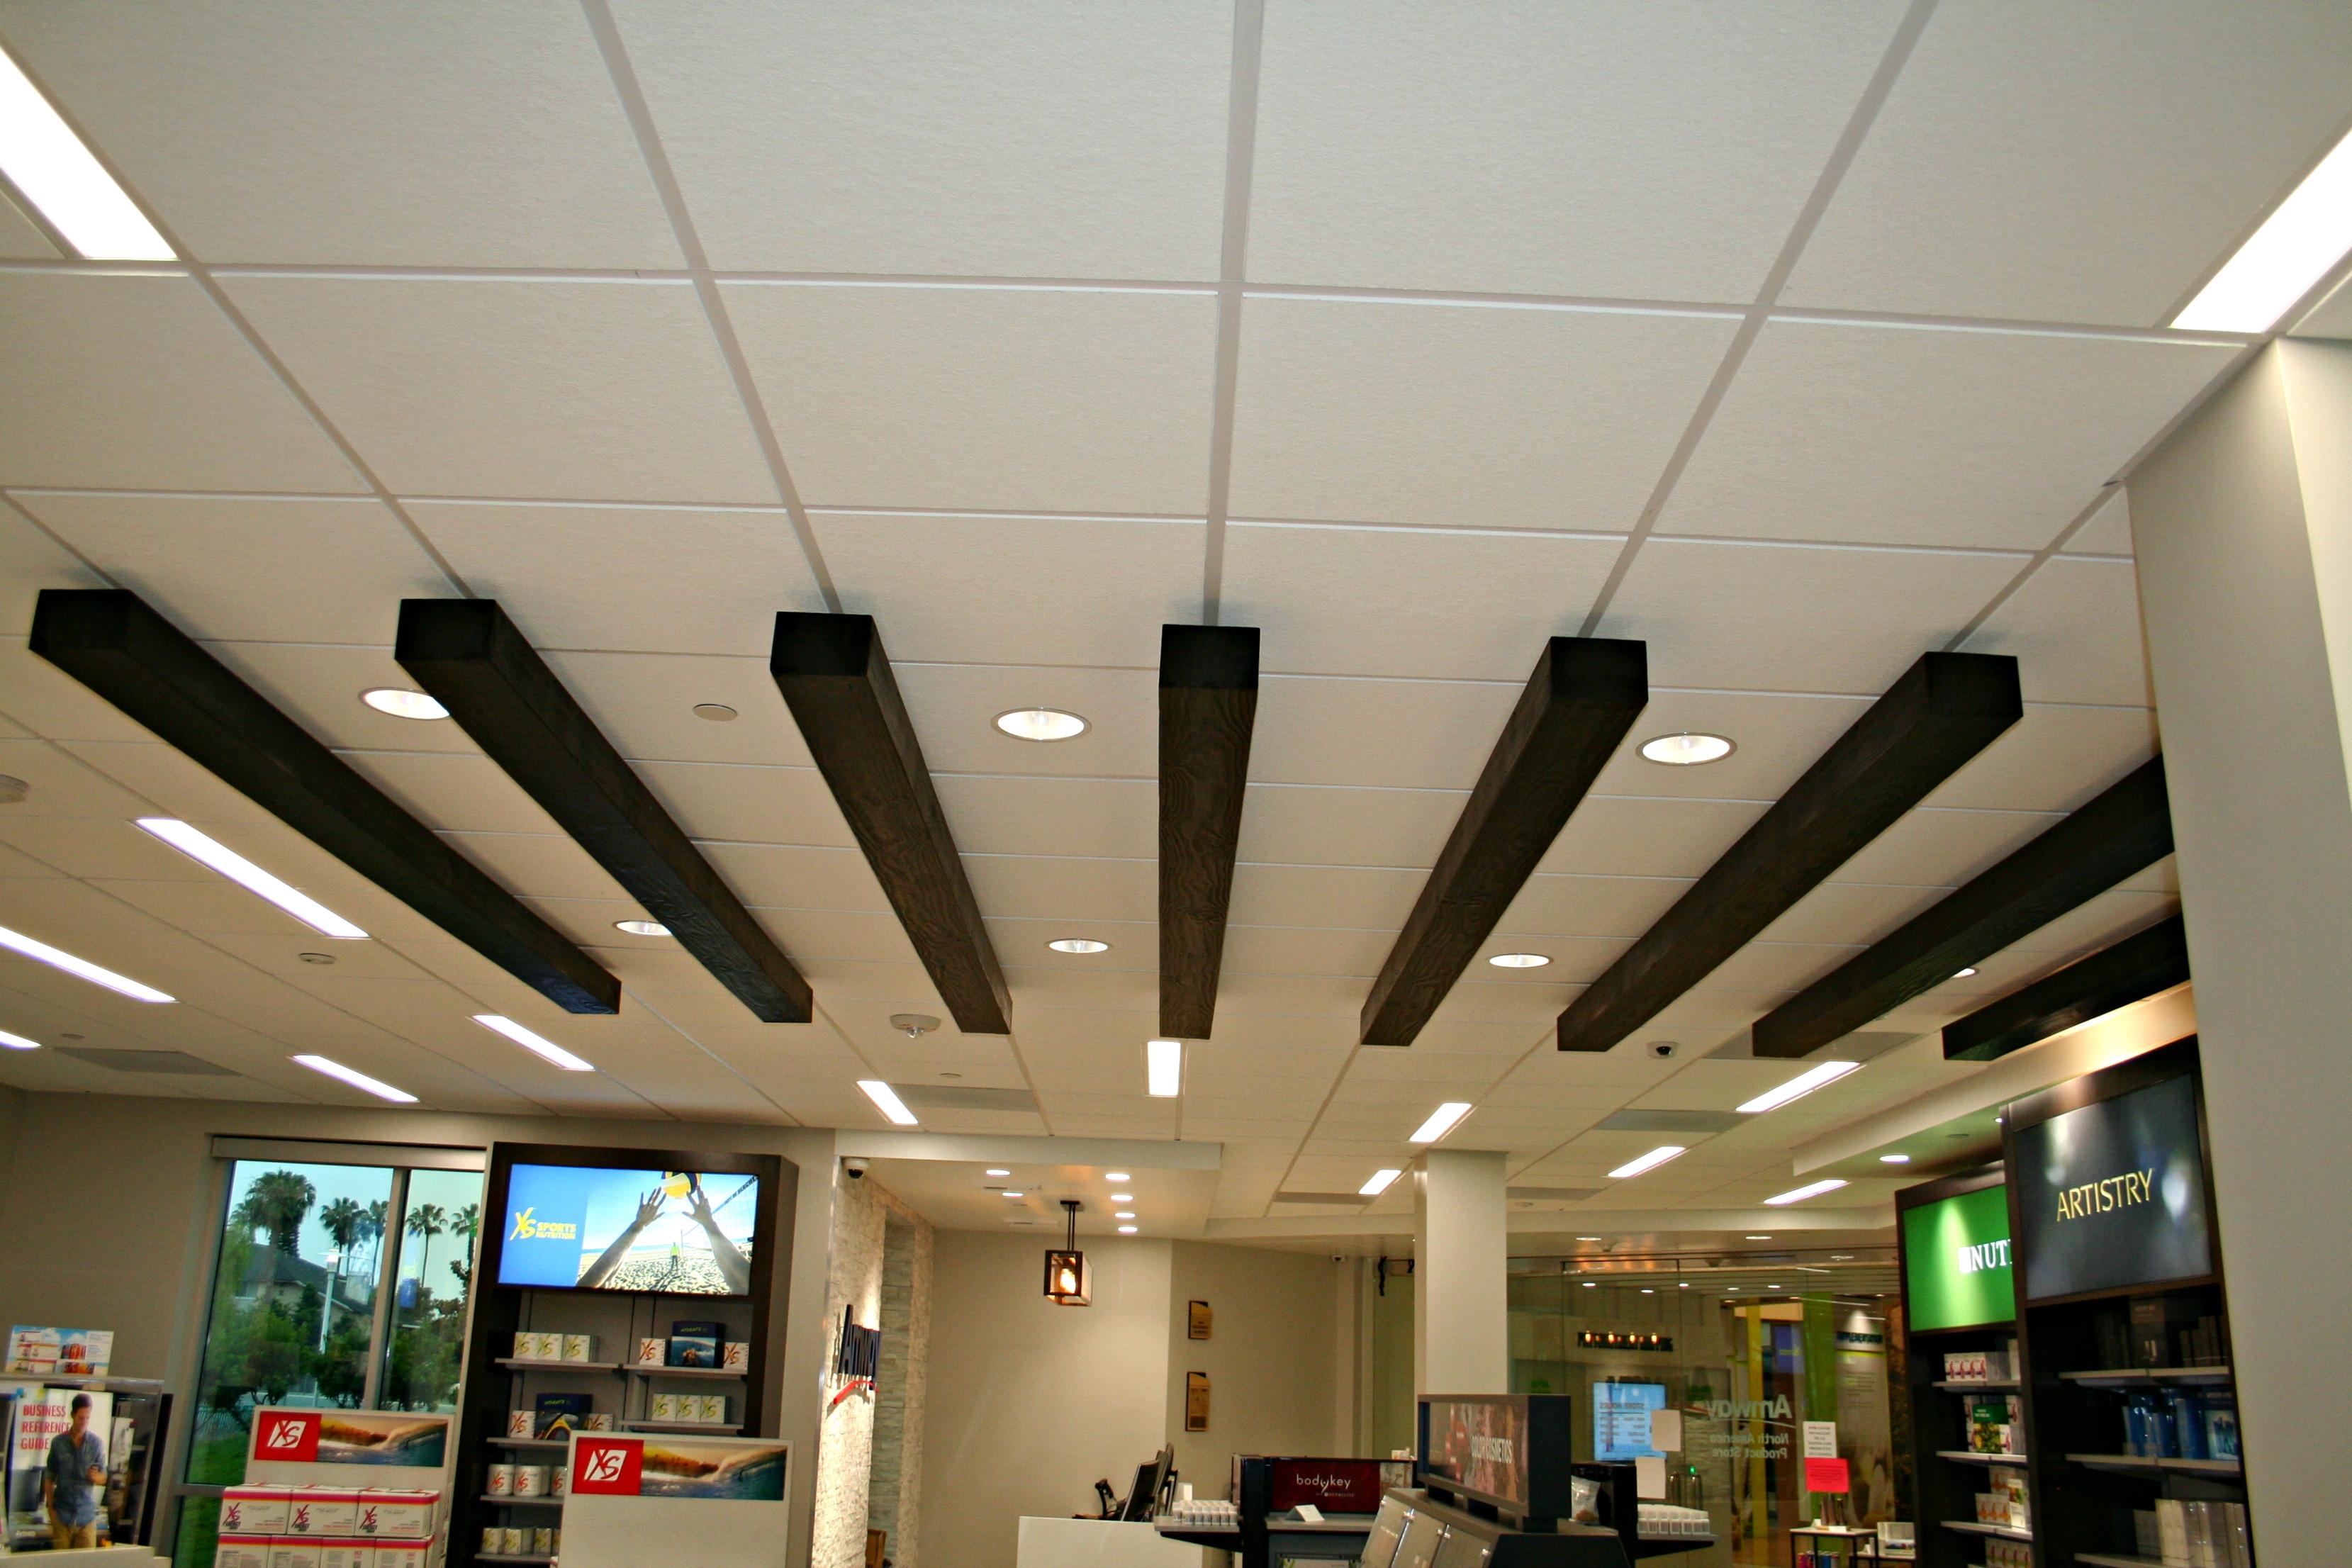 showroom beam ceiling